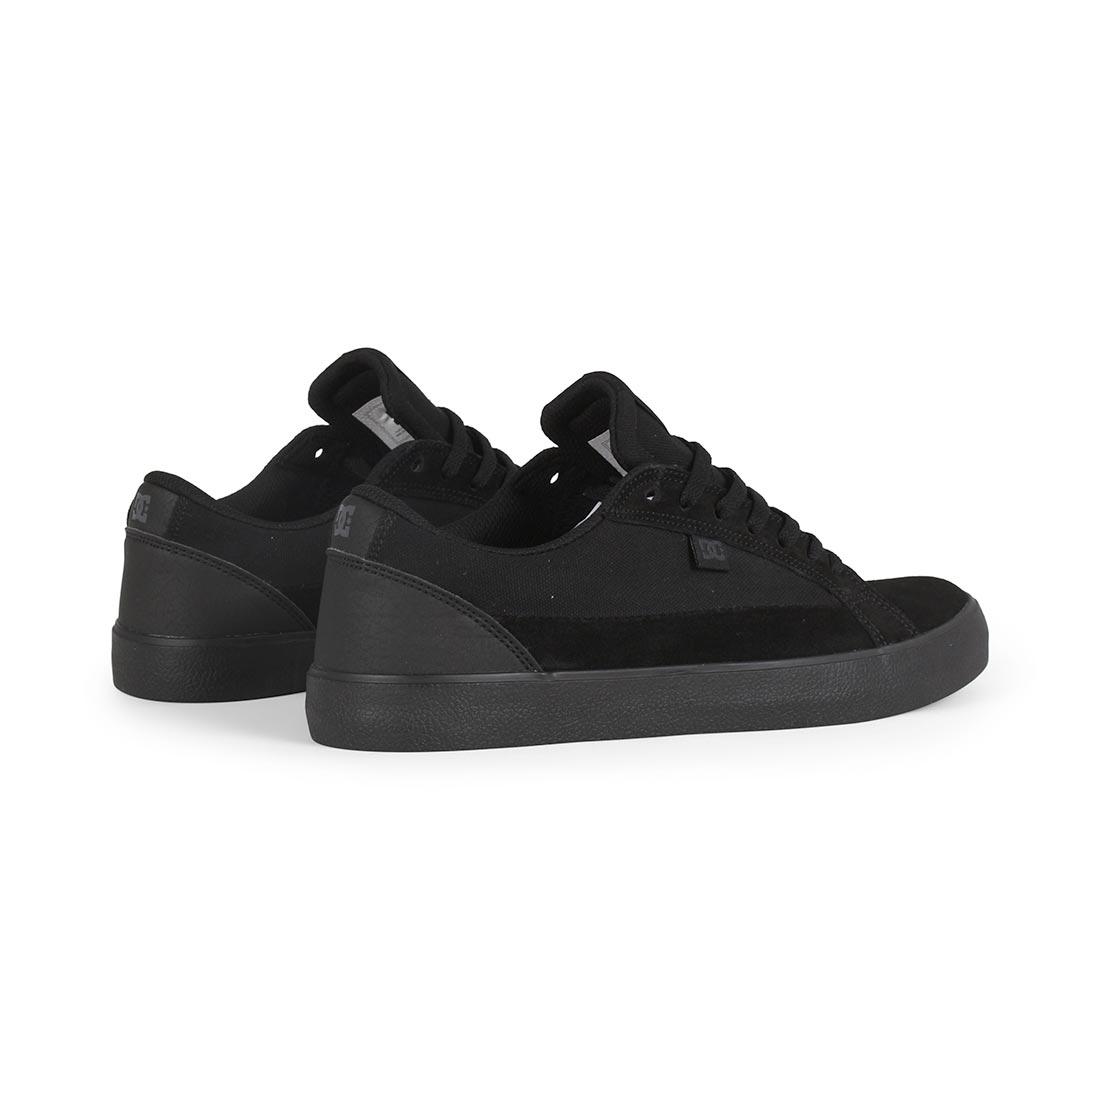 DC Shoes Lynnfield S - Black / Black / Black